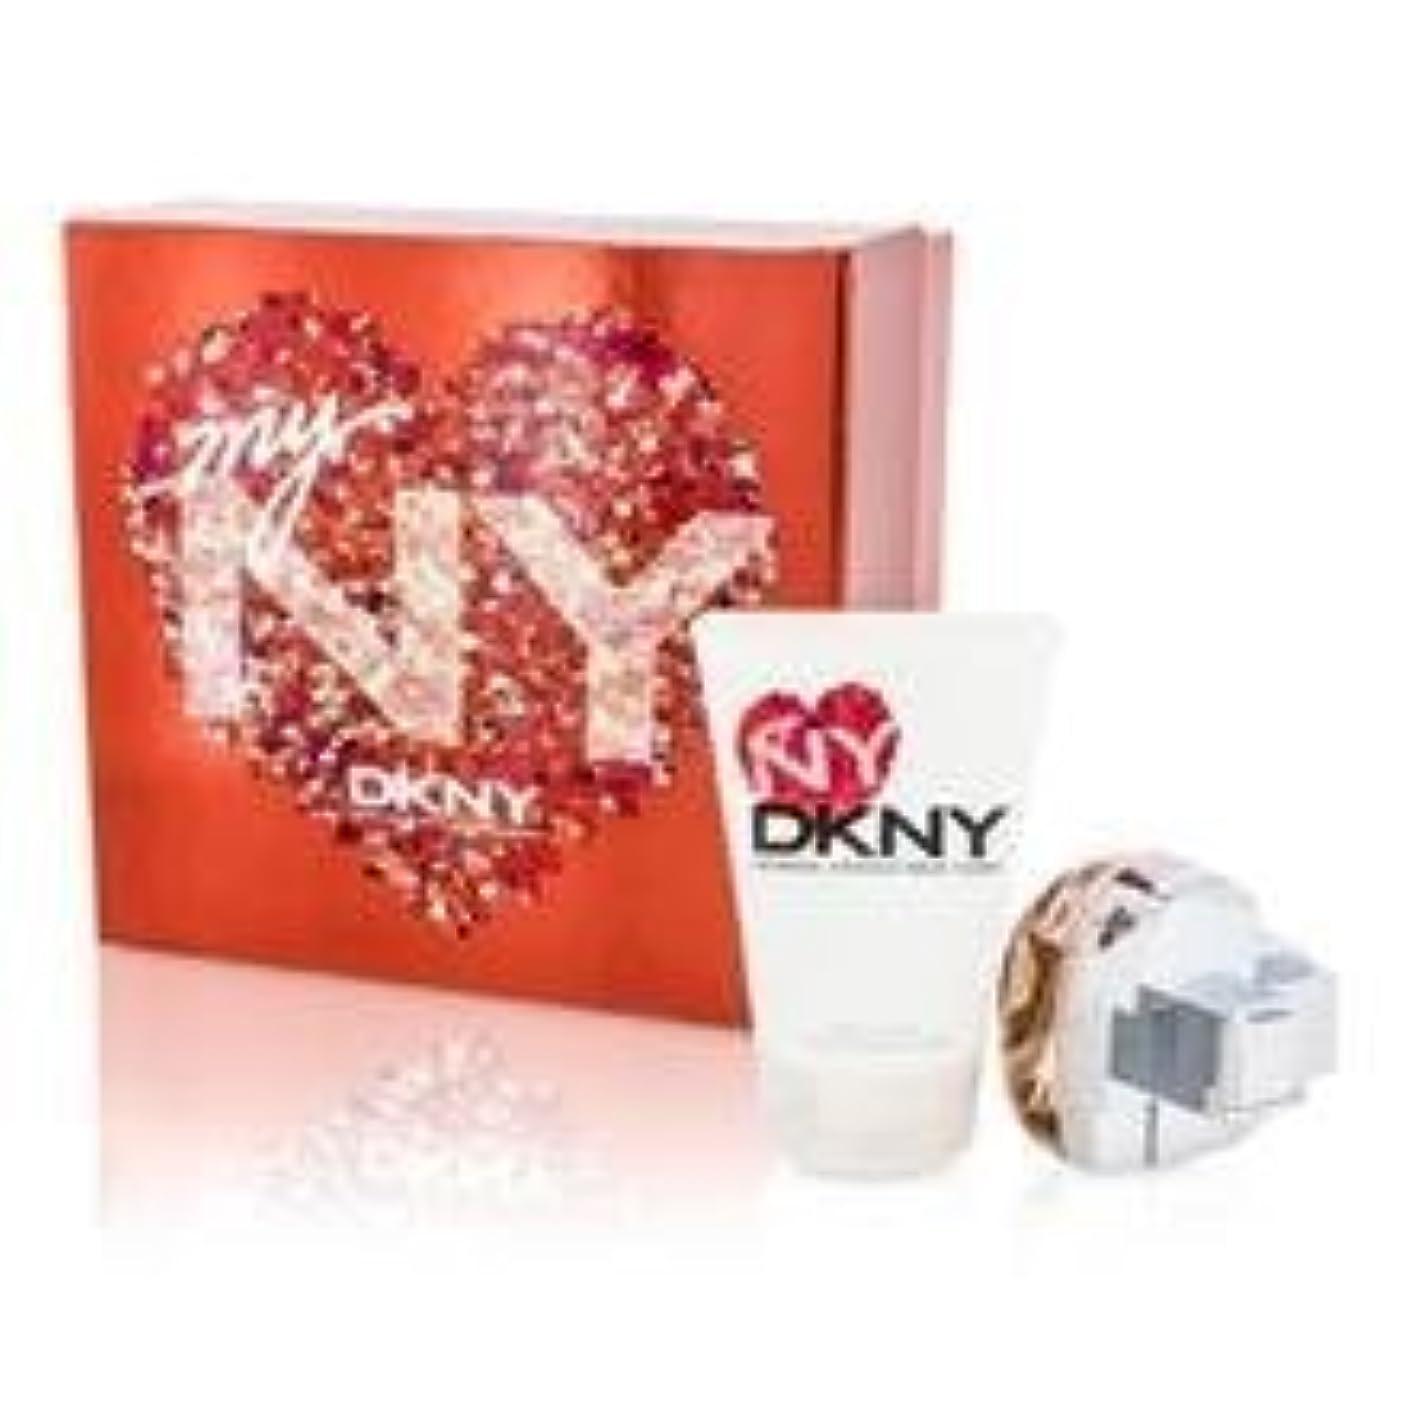 歴史盲信滑り台DKNY My NY The Heart Of The City Coffret: Eau De Parfum Spray 50ml/1.7oz + Body Lotion 100ml/3.4oz 2pcs並行輸入品